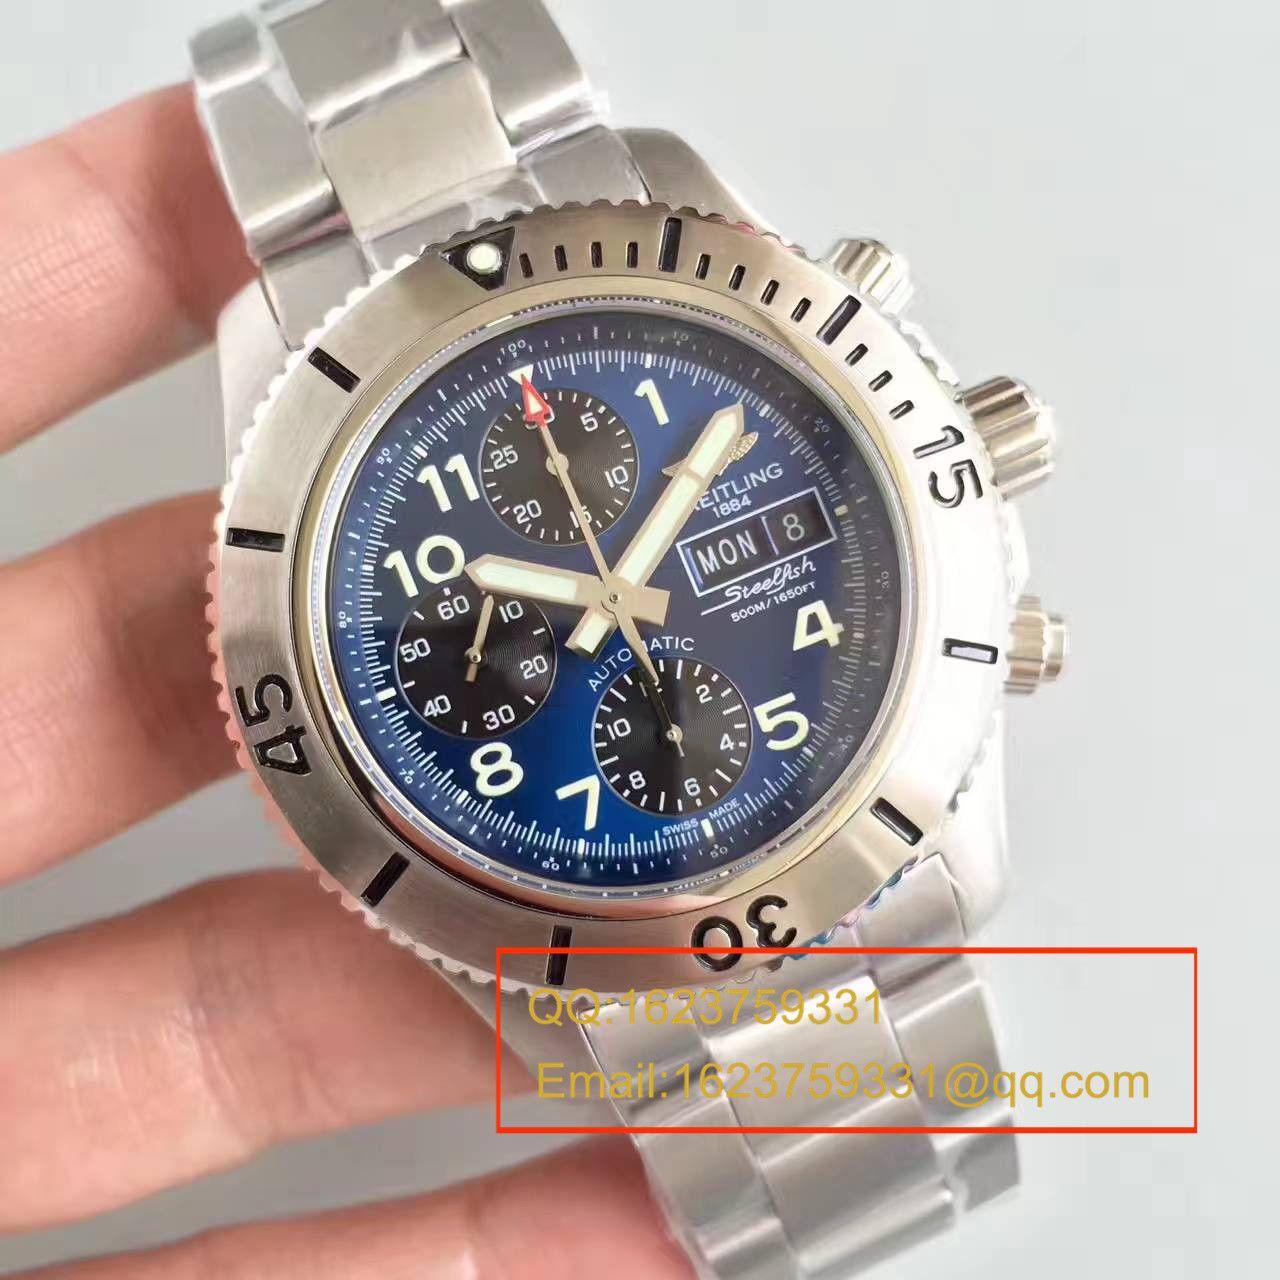 【GF一比一超A精仿手表】百年灵超级海洋系列A13341C3/C893/200S/A20DSA.2钢鱼计时腕表 / BL071